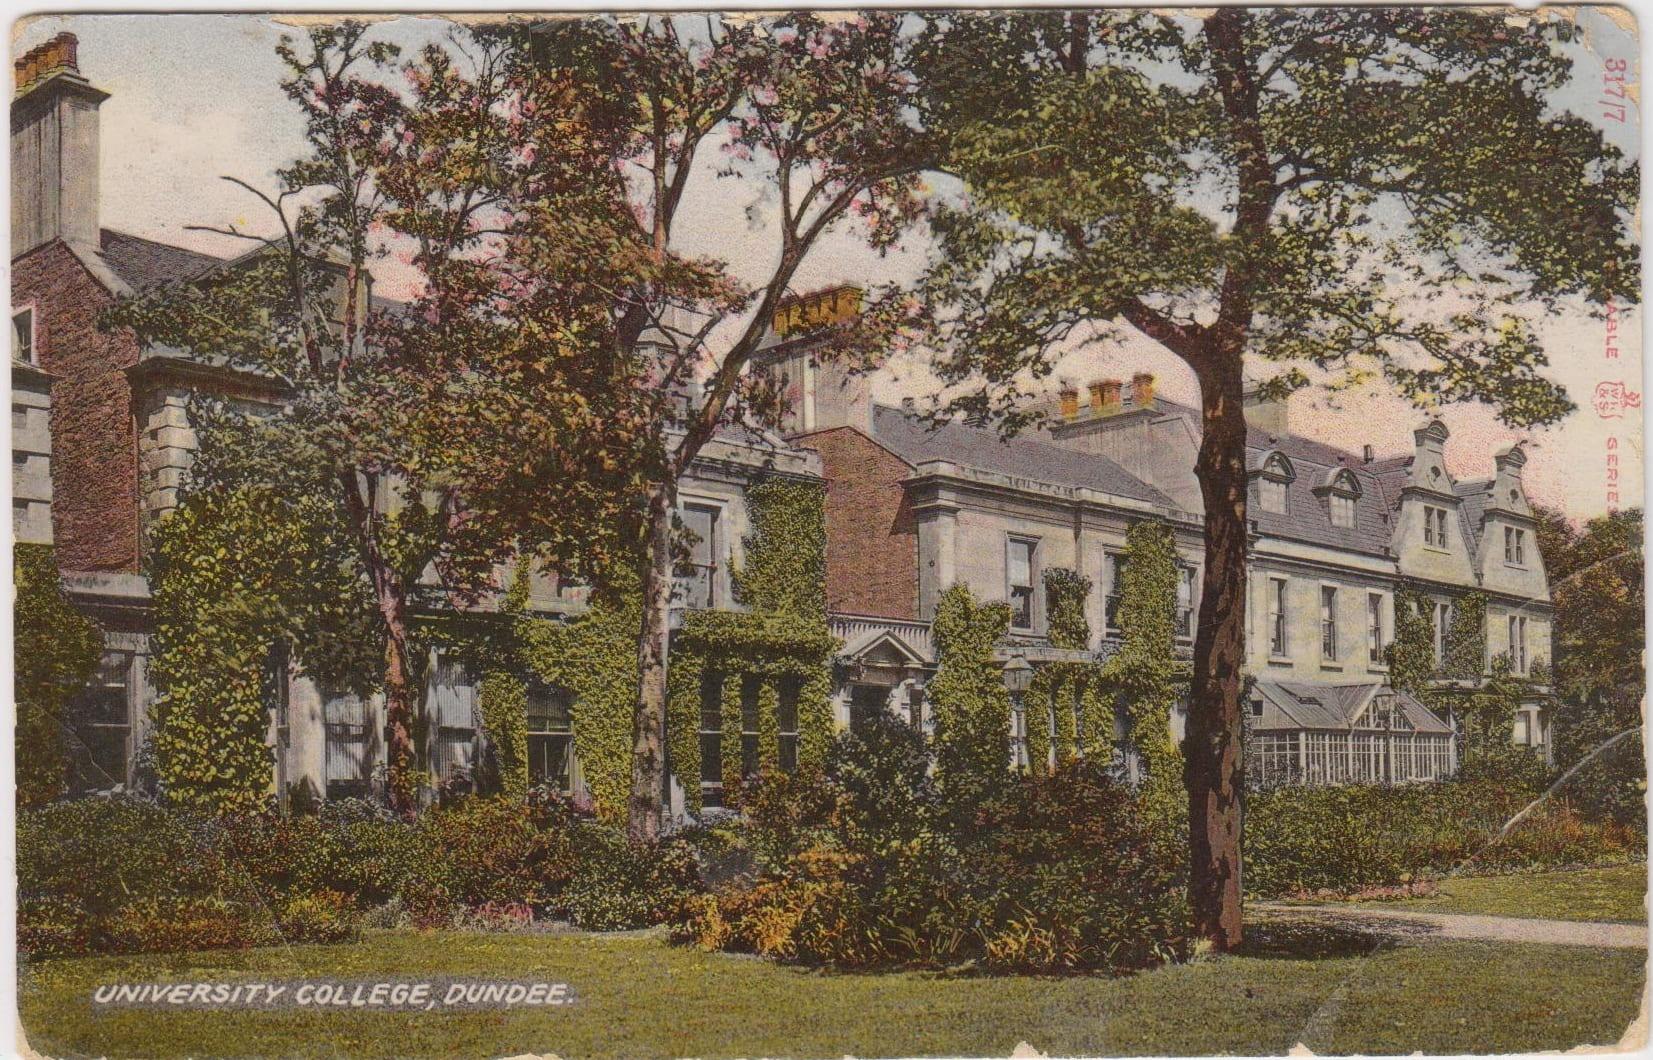 University College Dundee postcard